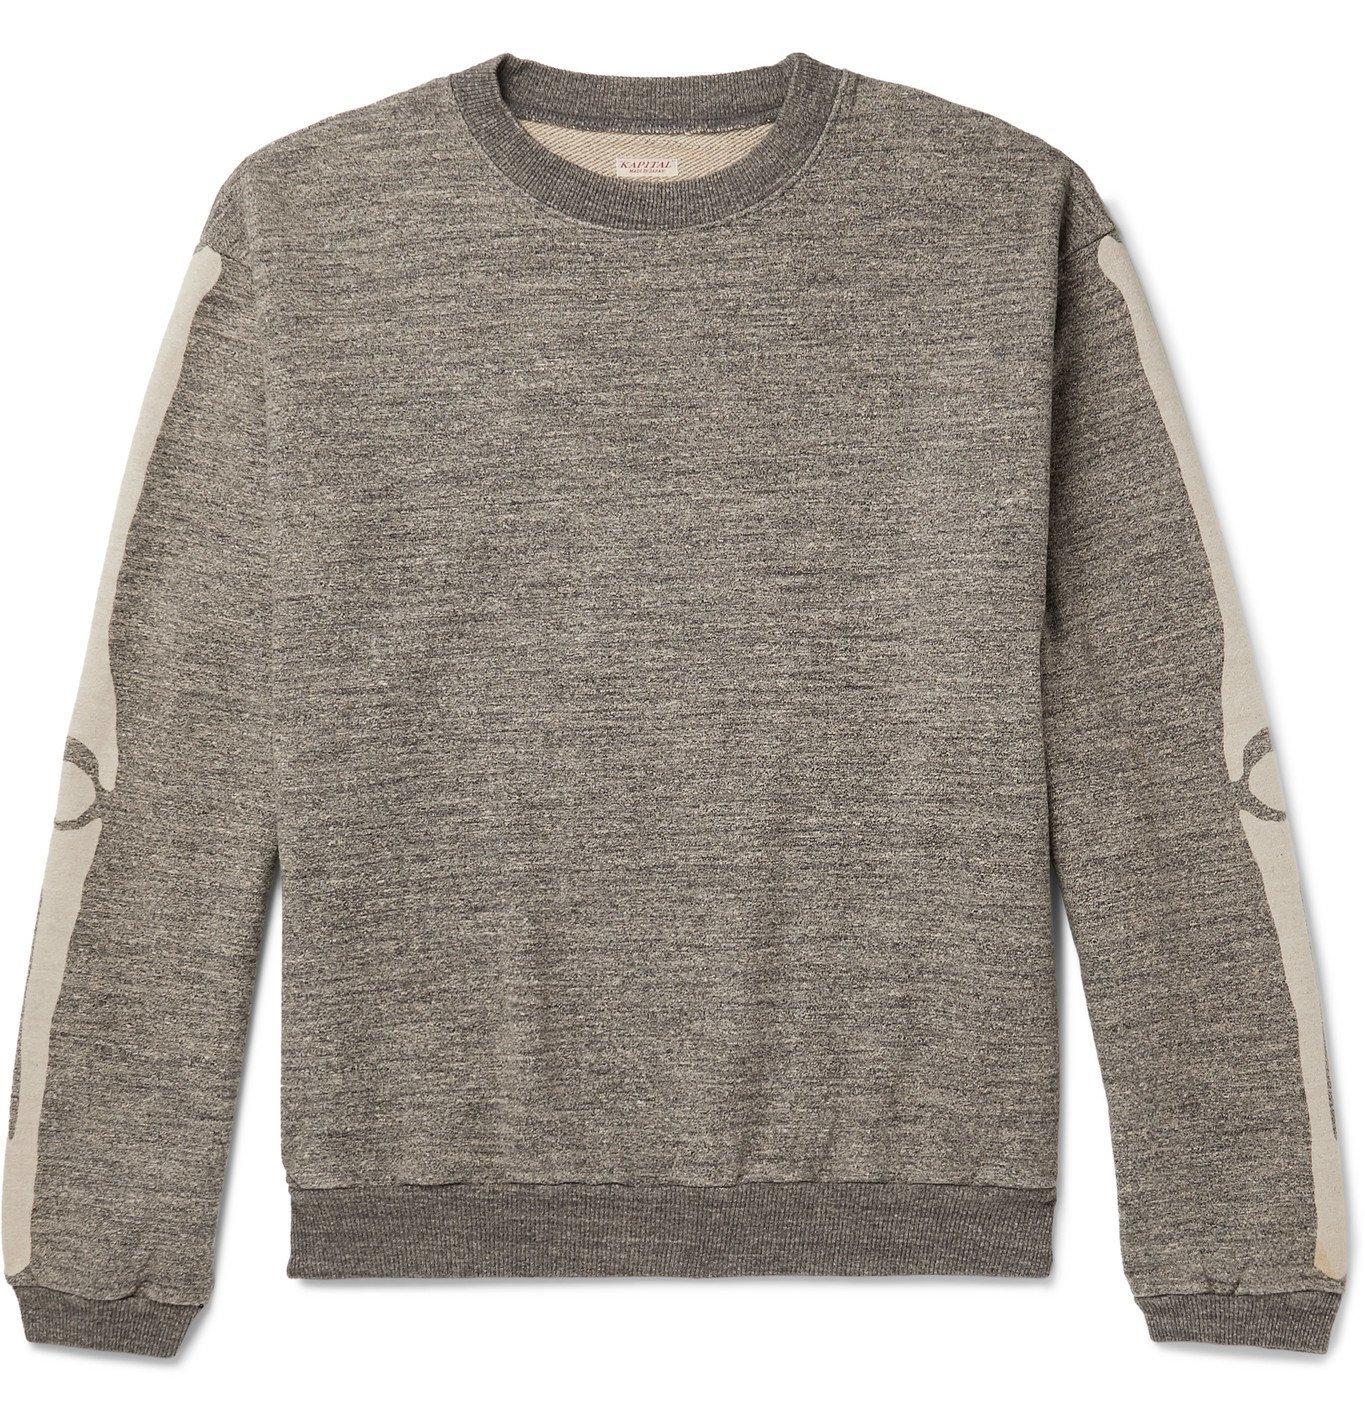 KAPITAL - Oversized Printed Mélange Loopback Cotton-Jersey Sweatshirt - Gray